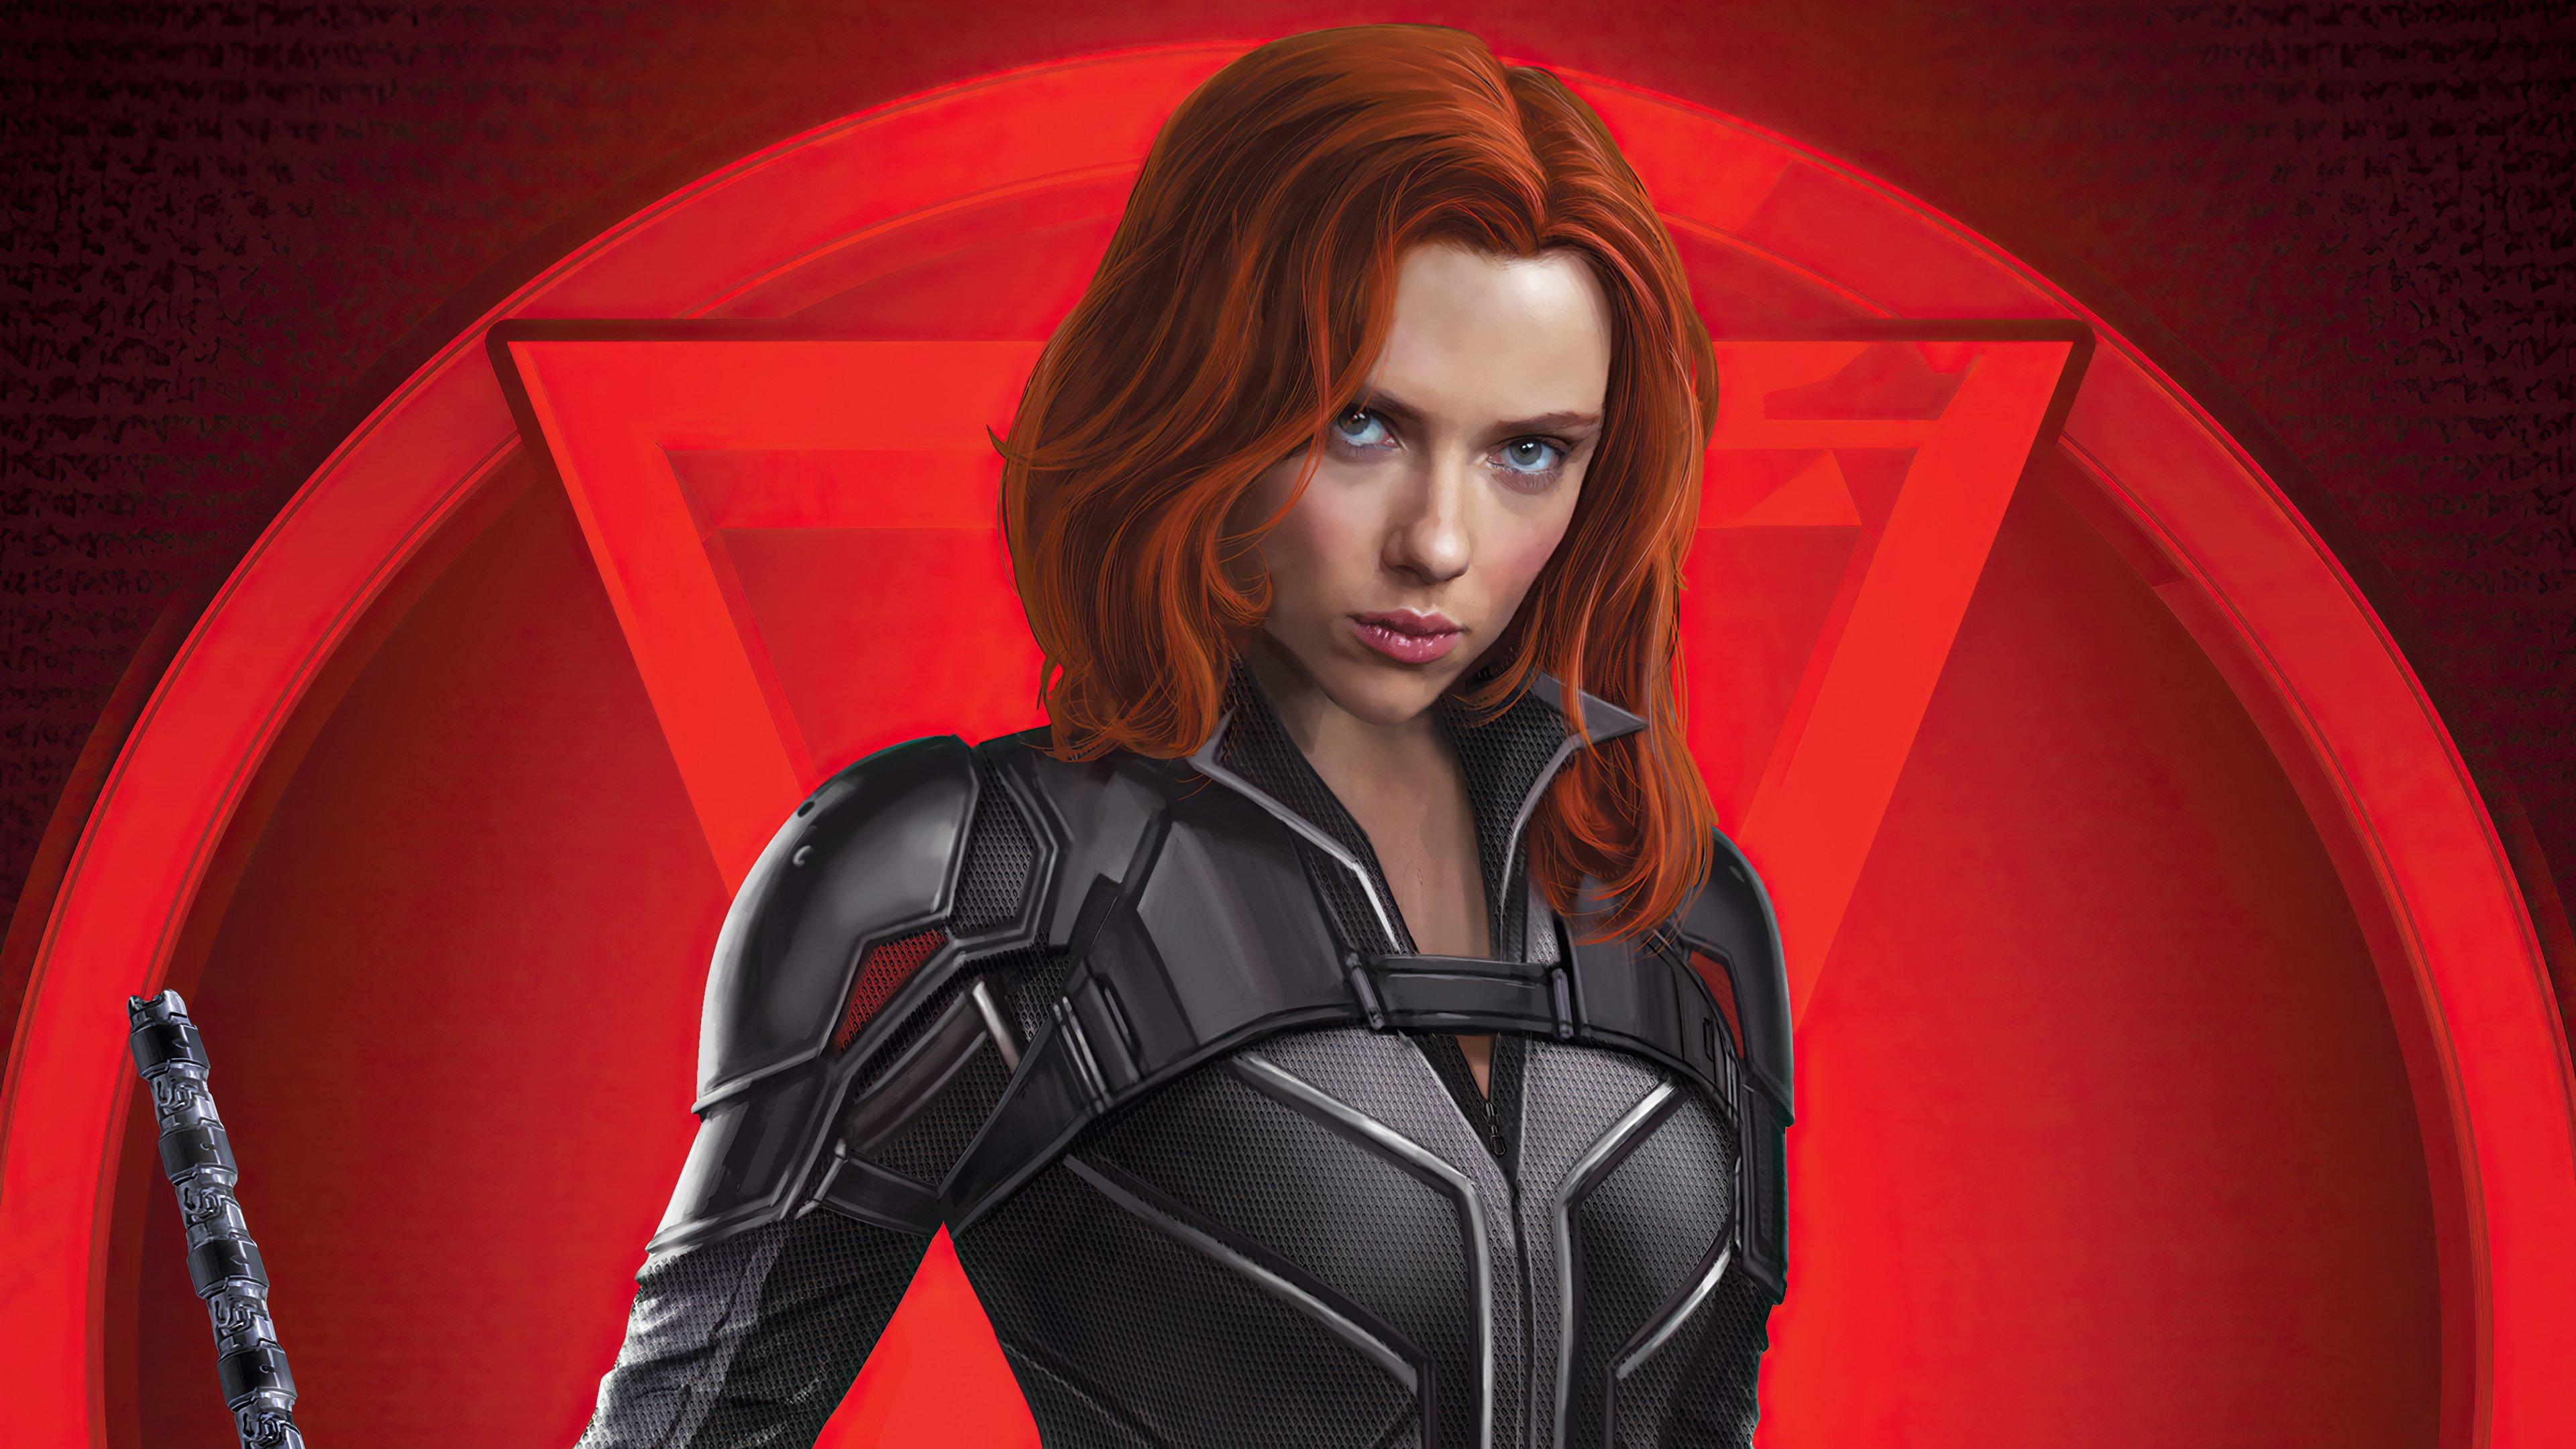 Wallpaper Black Widow Movie Art